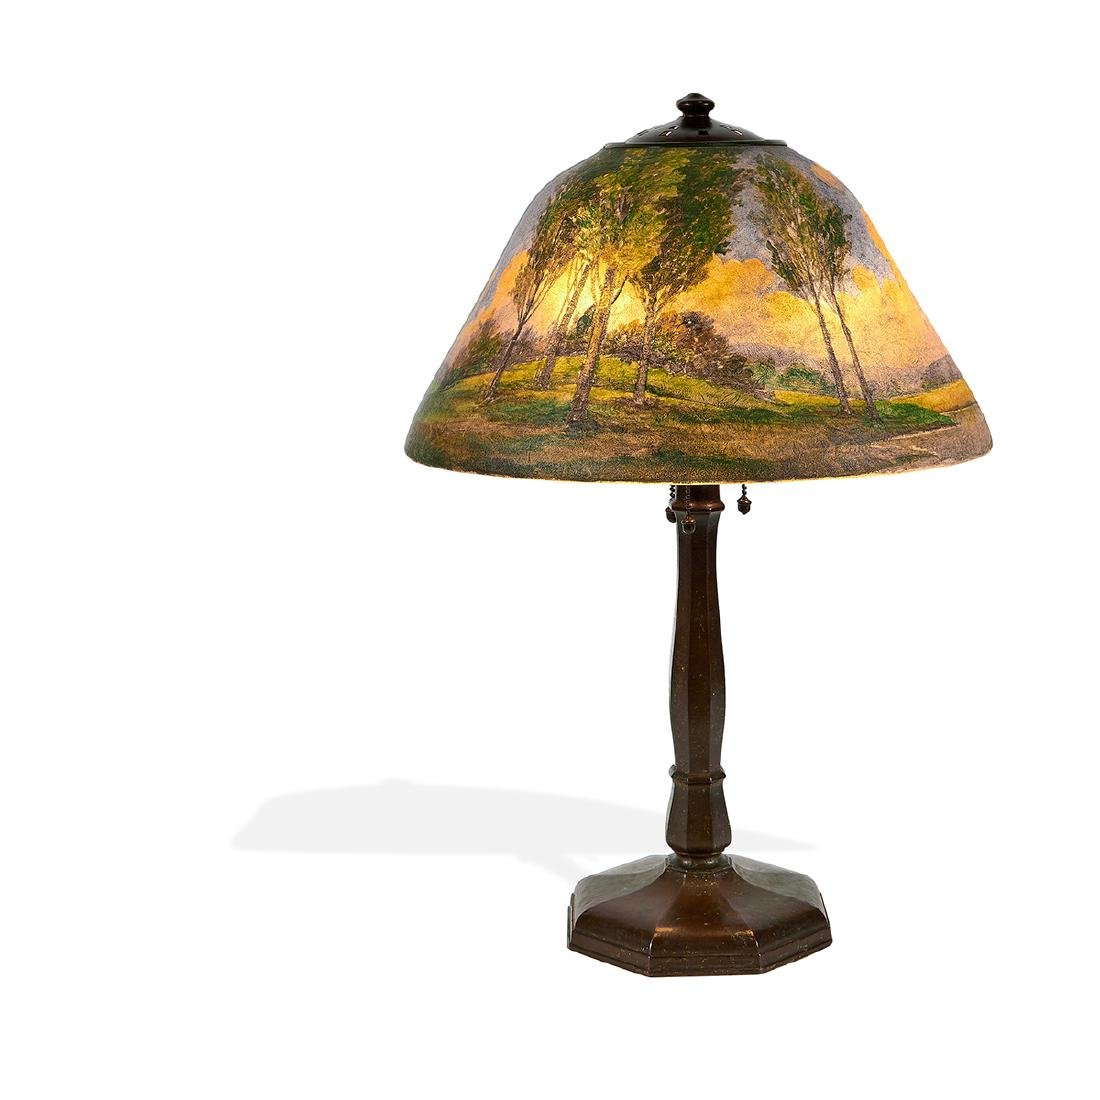 Handel, Obverse Painted Landscape Table Lamp